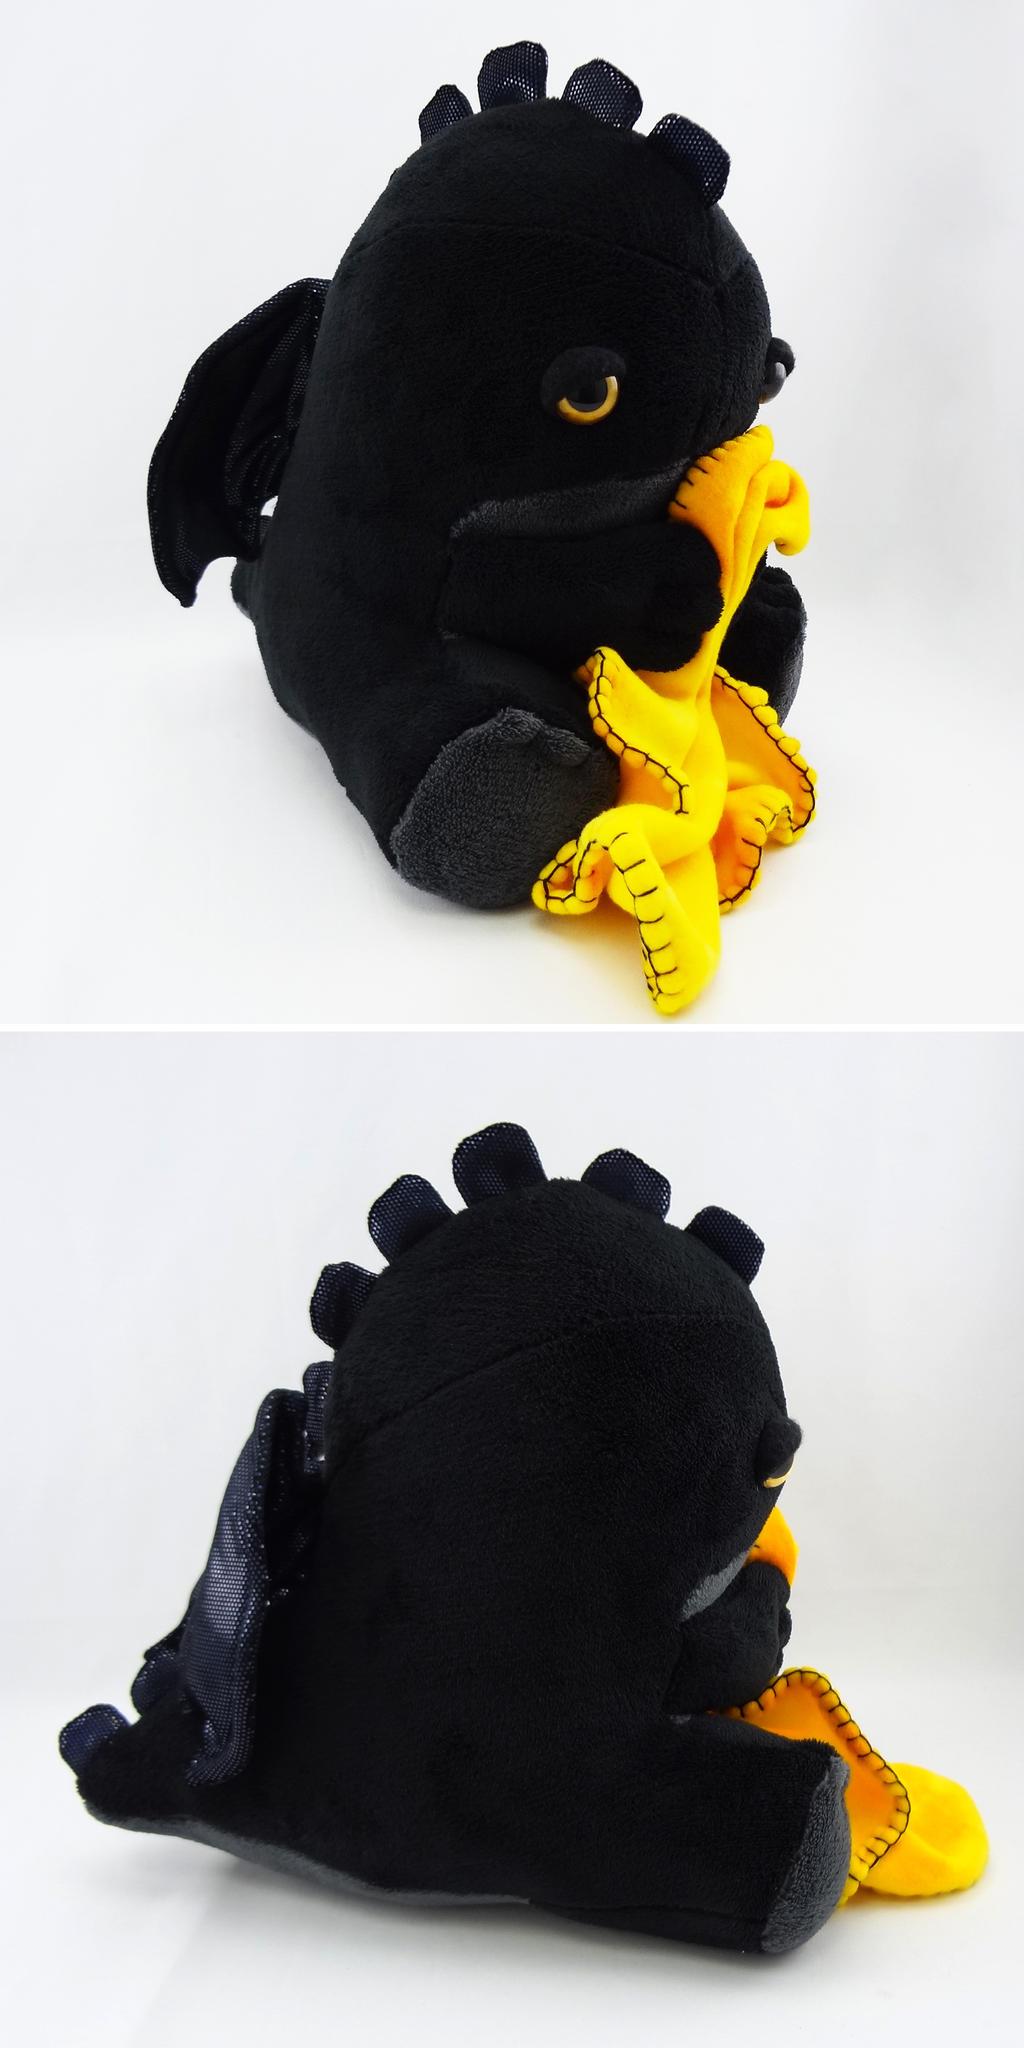 Sleepy yellow eyed black dragon